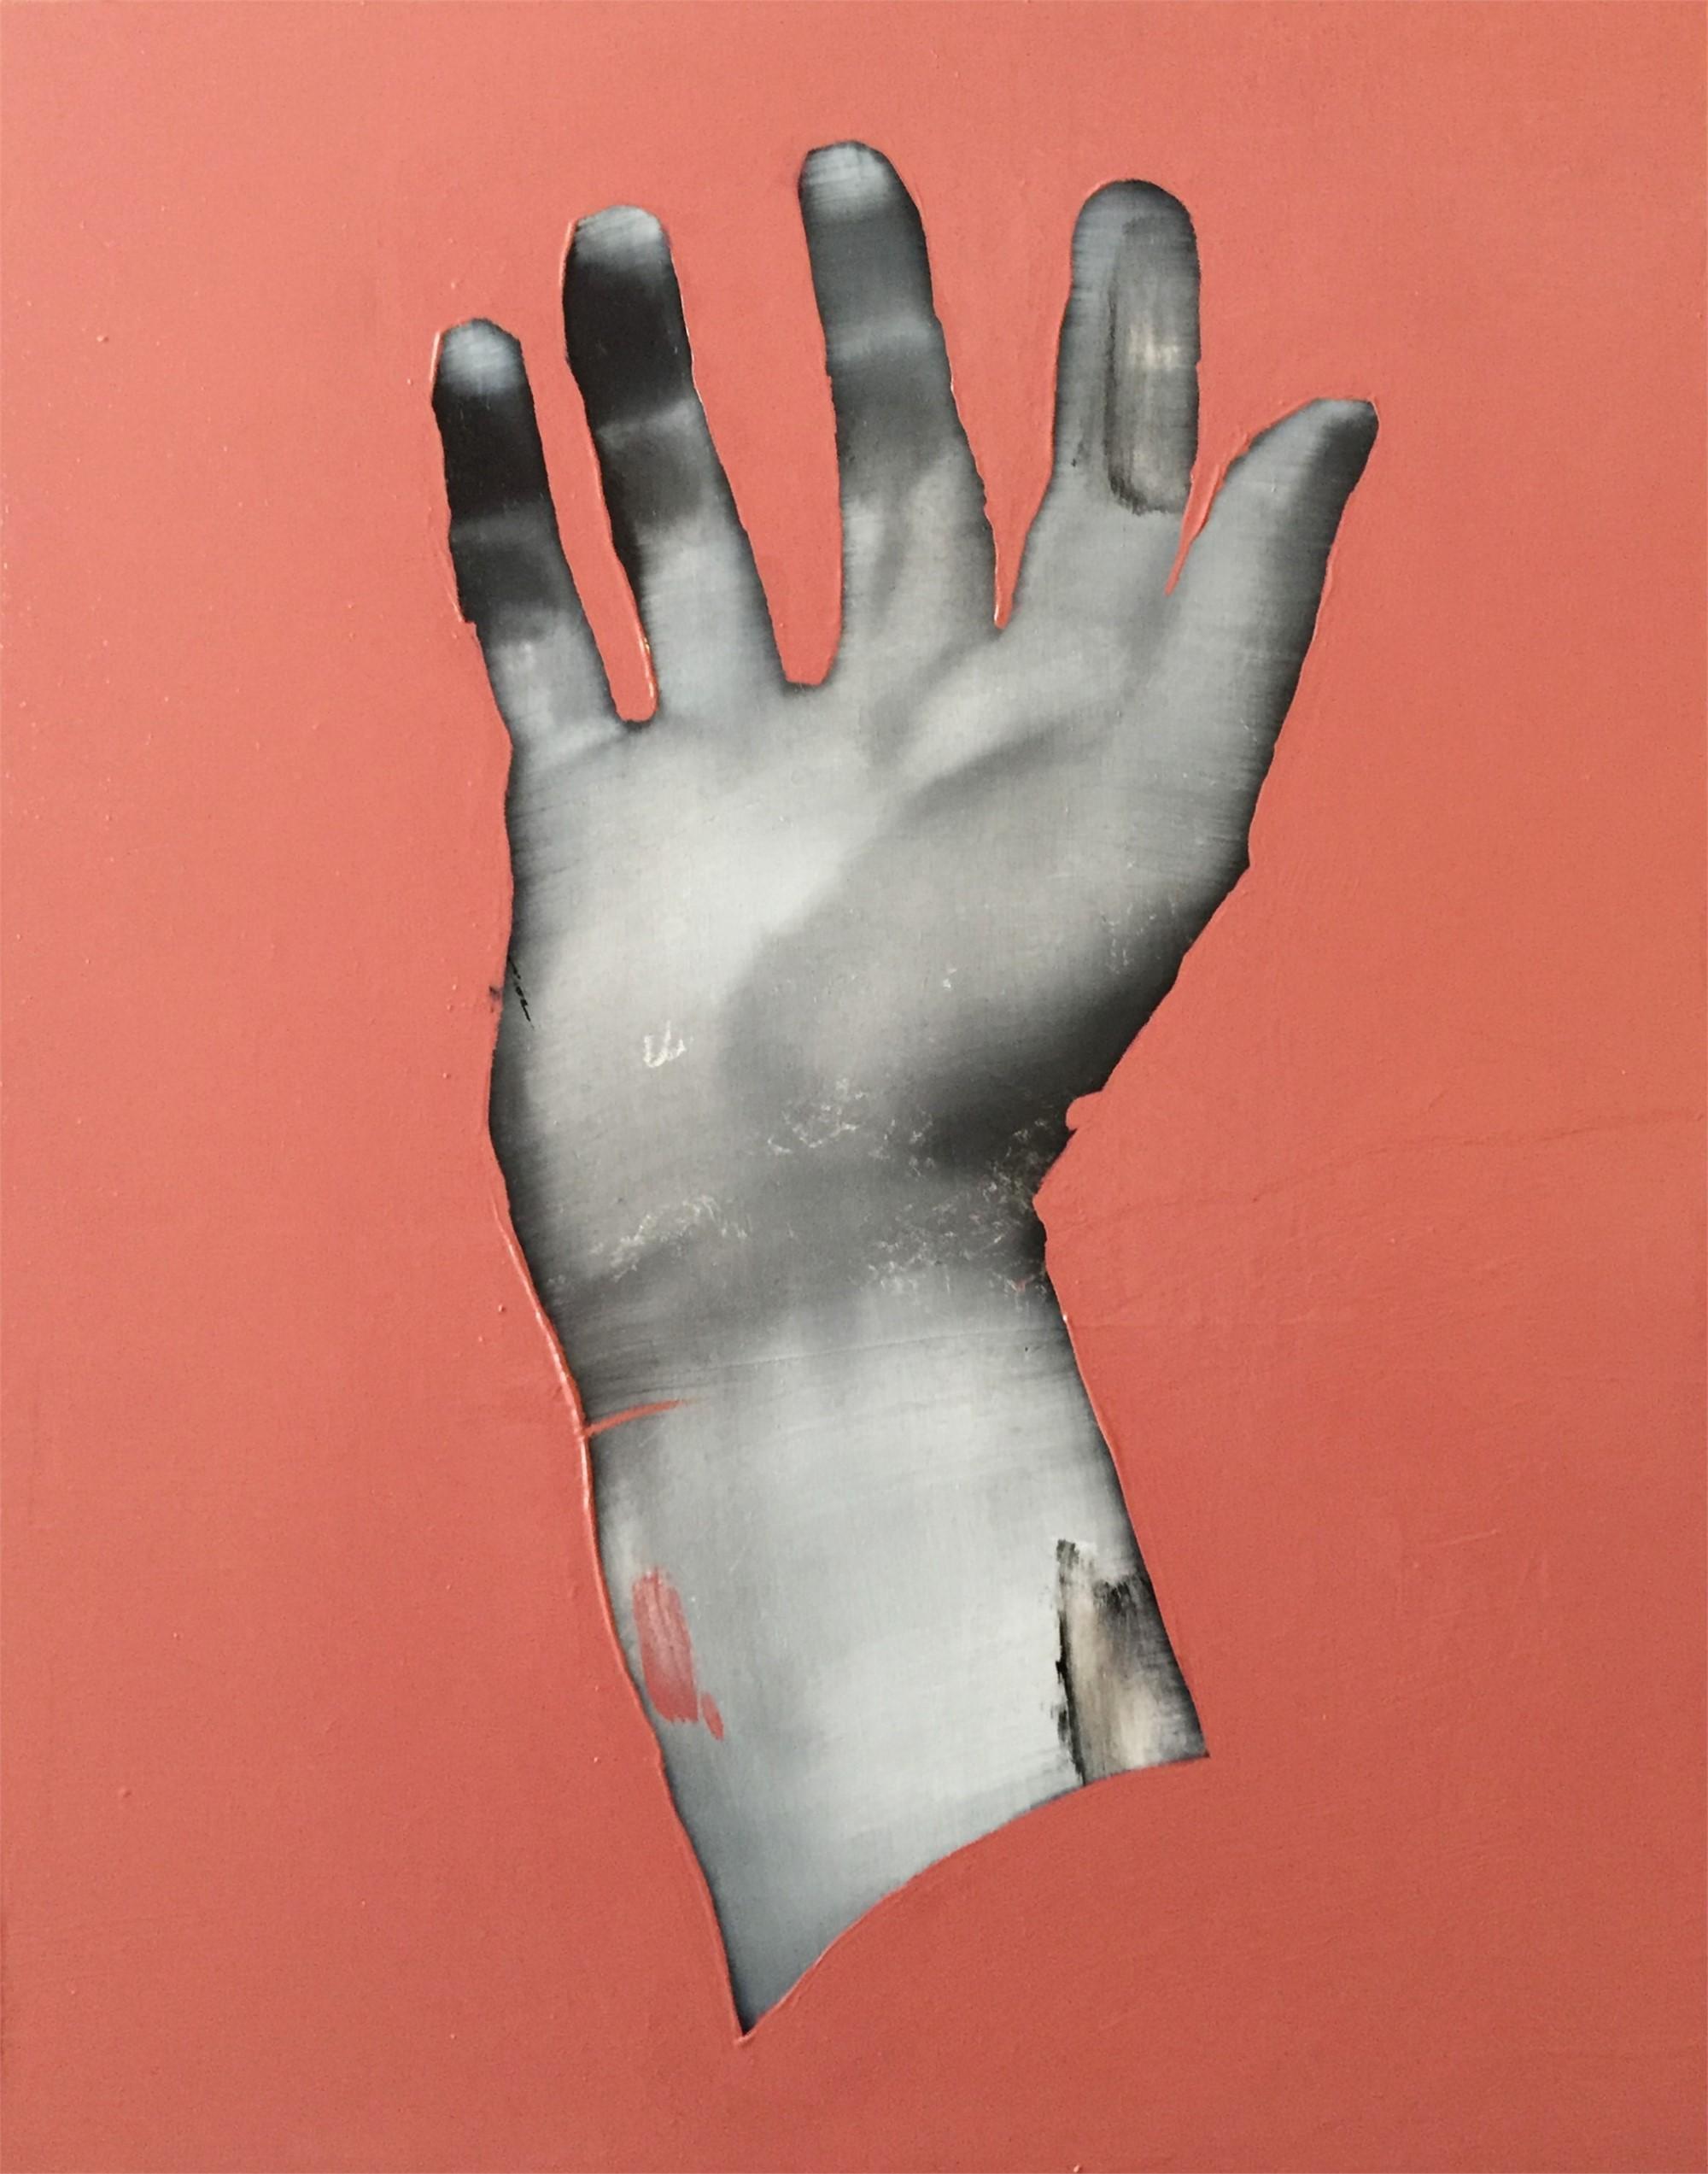 Hand Study 2 by Wendelin Wohlgemuth